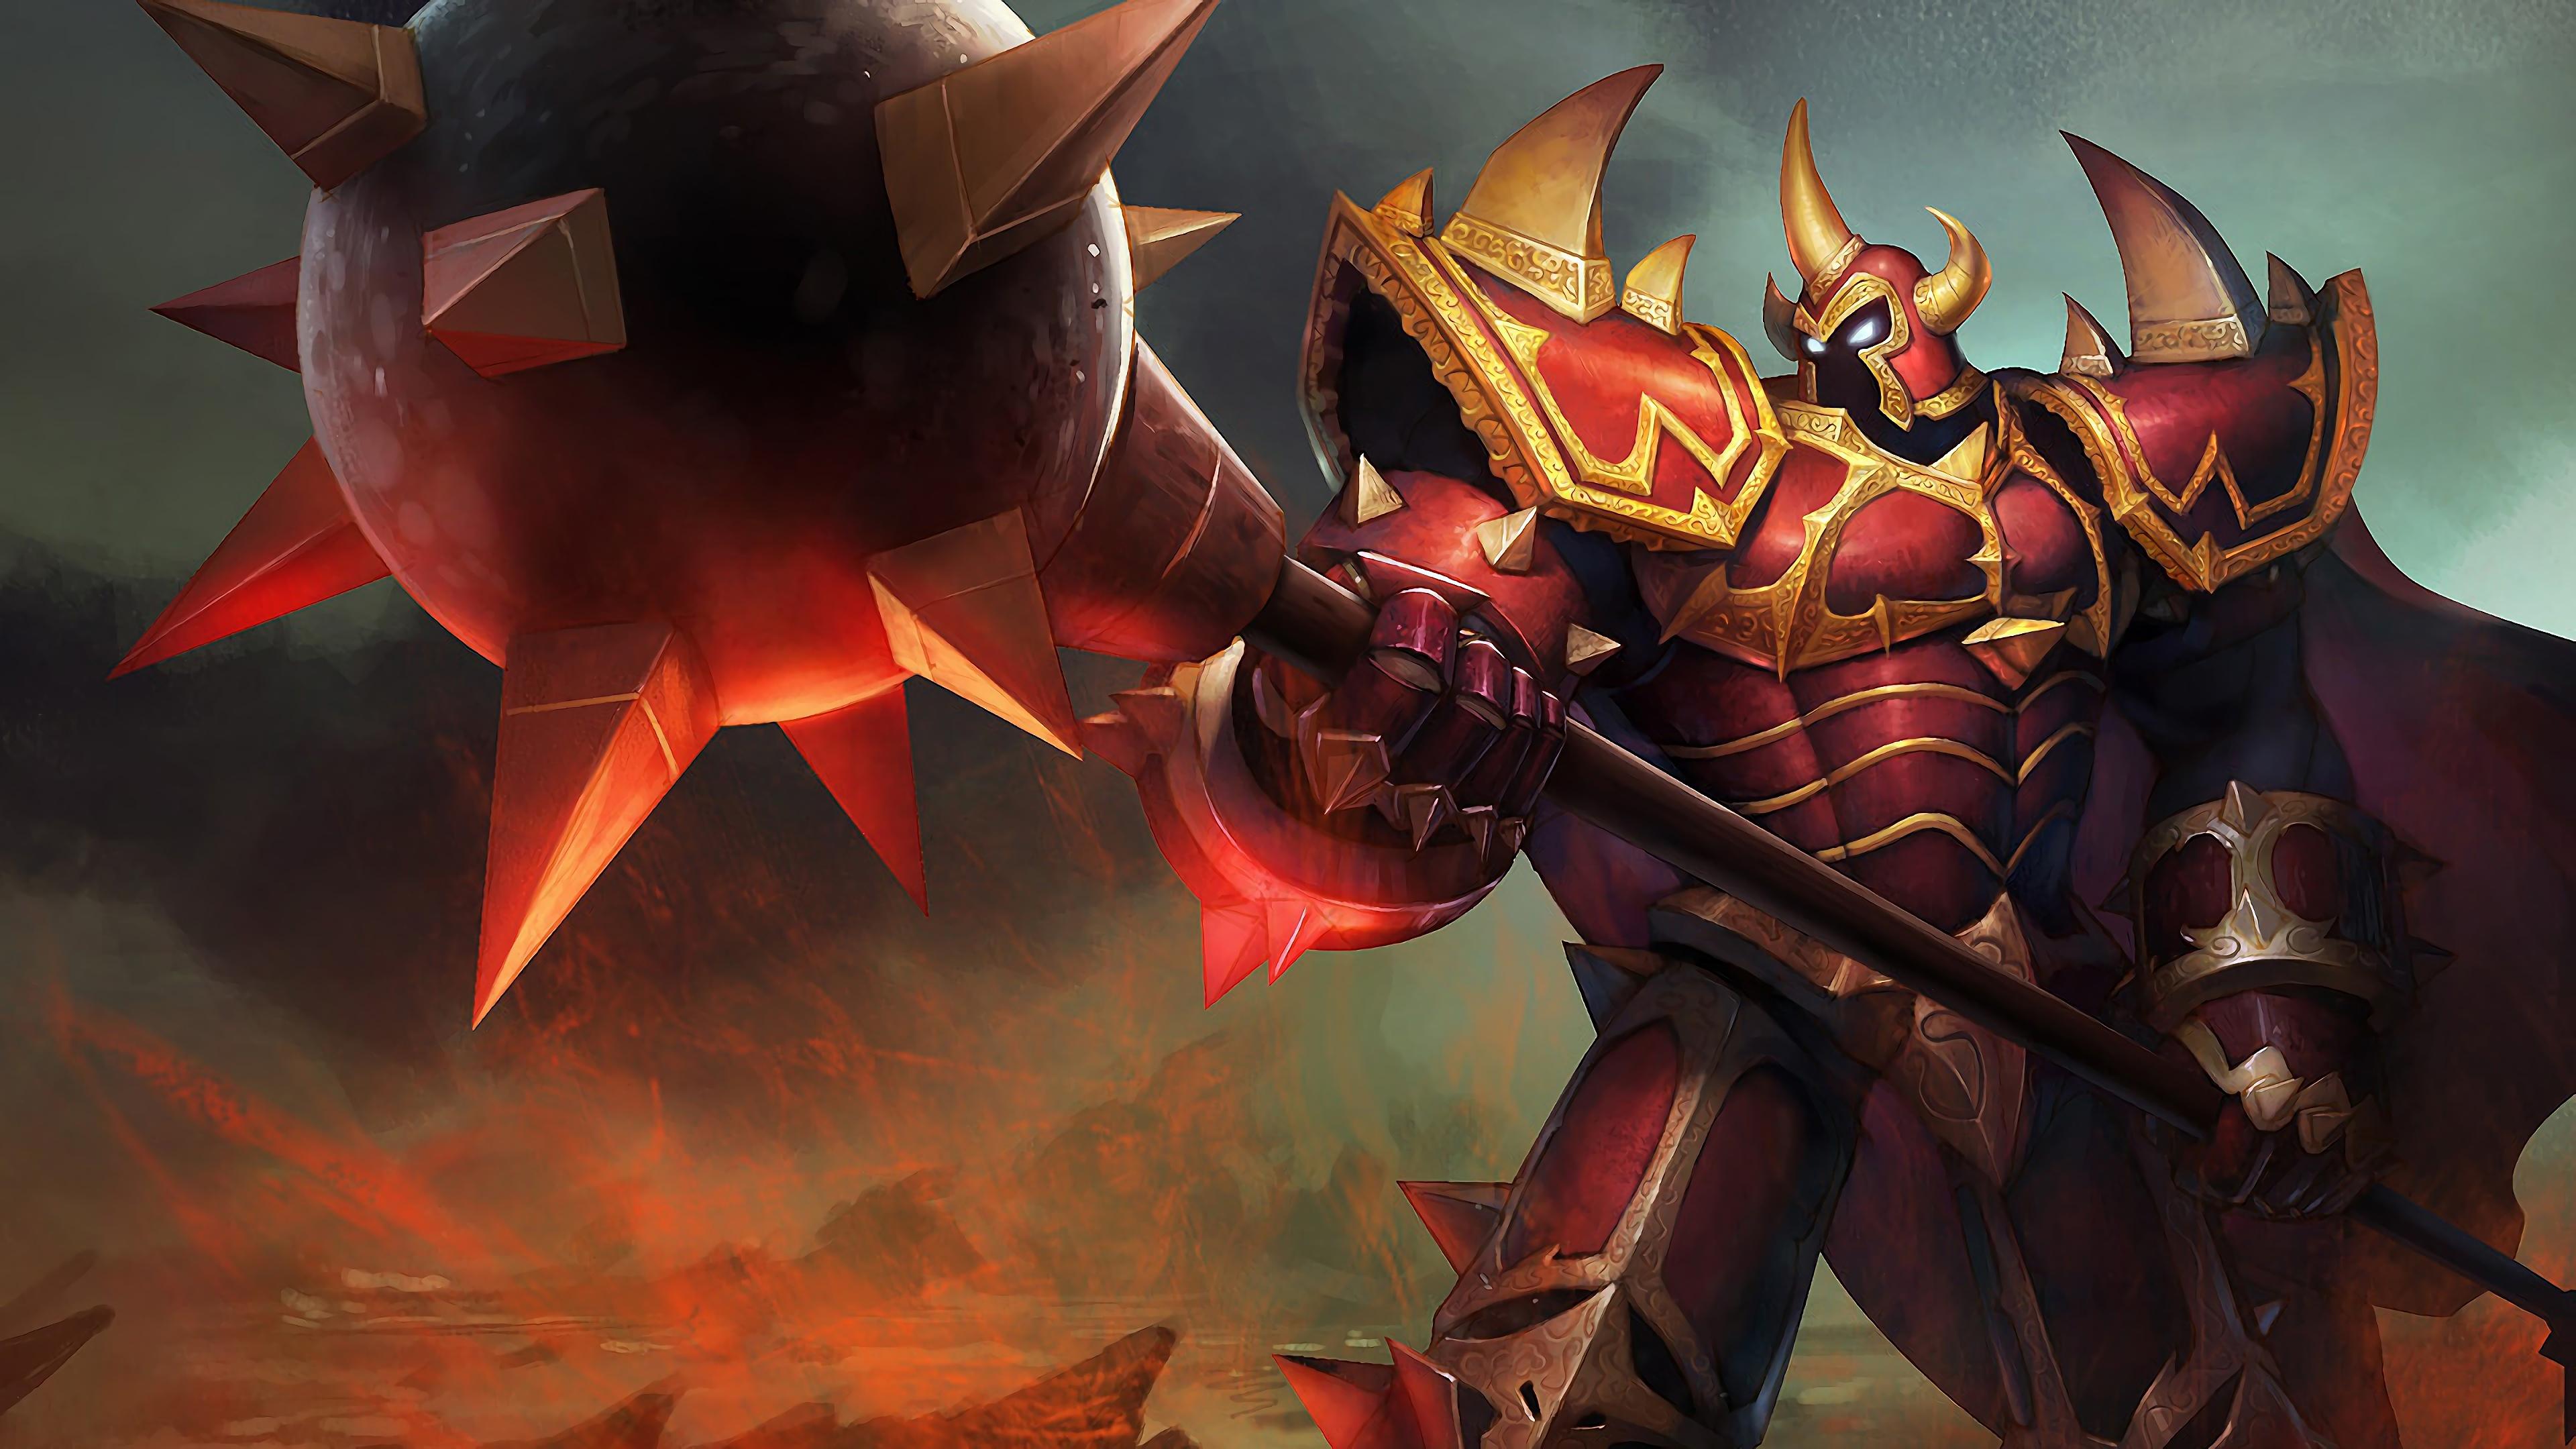 dragon knight mordekaiser lol splash art league of legends 1574100343 - Dragon Knight Mordekaiser LoL Splash Art League of Legends - Mordekaiser, league of legends